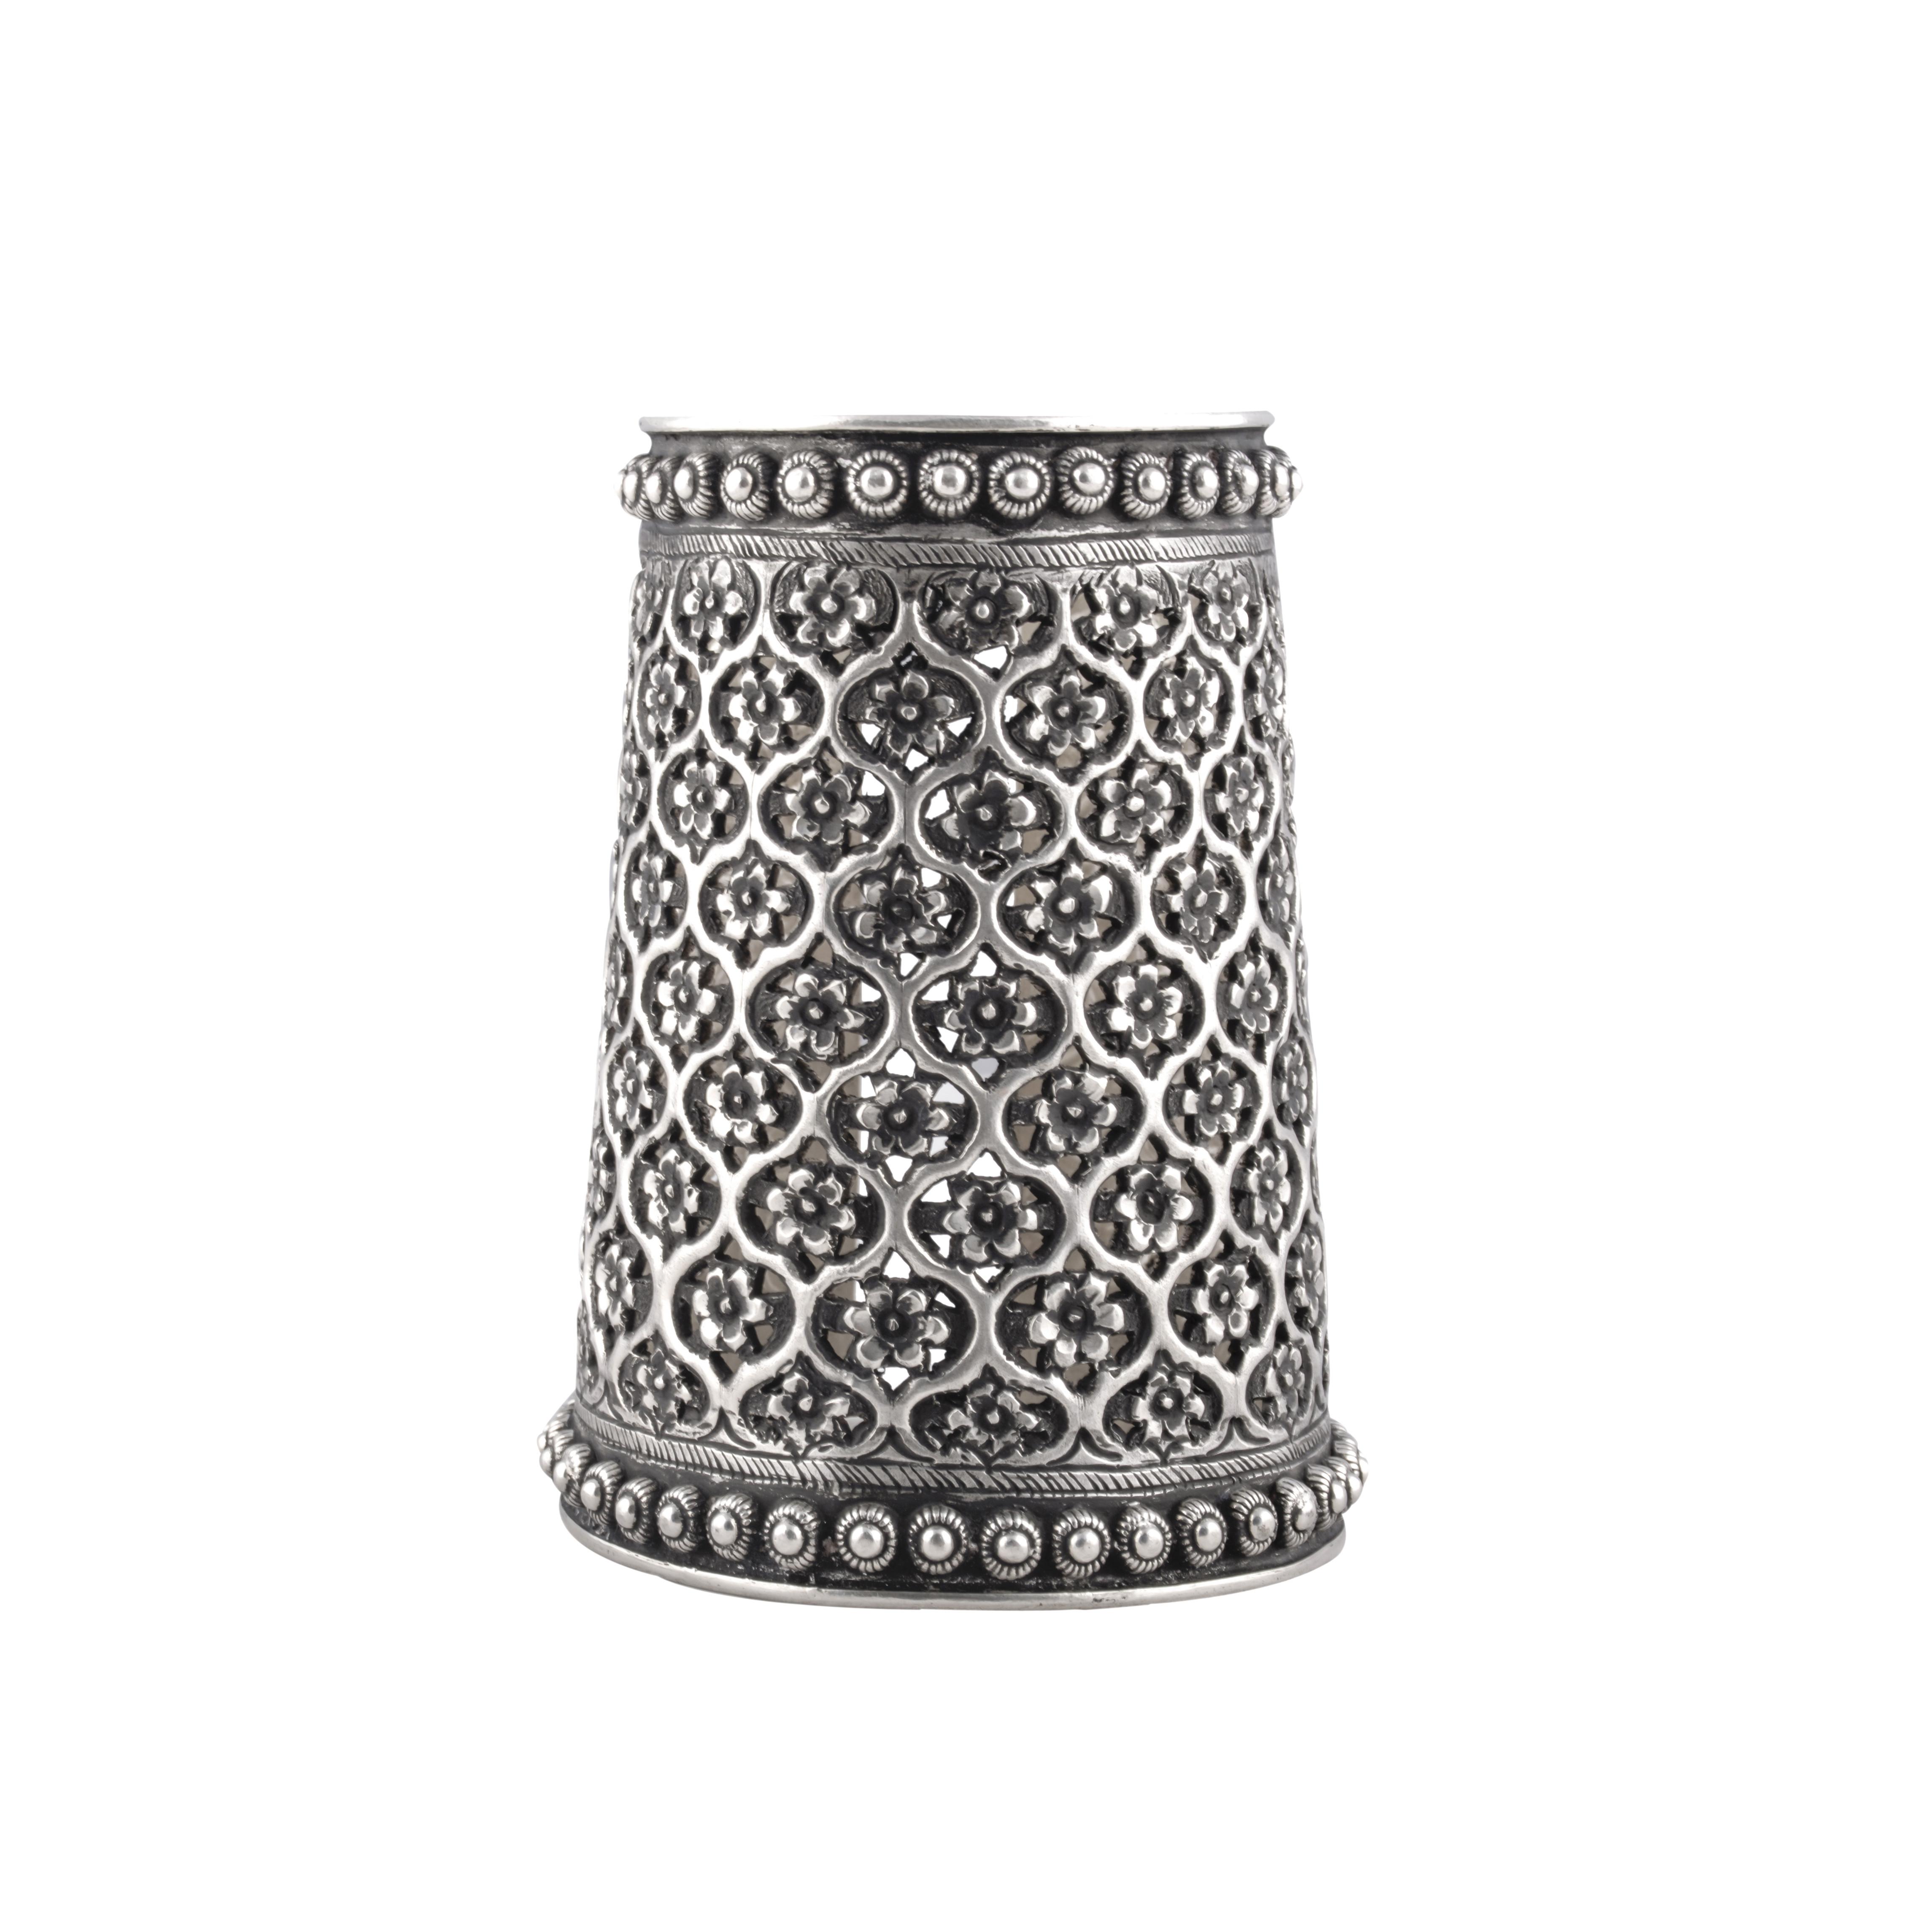 Handcarved silver bangle